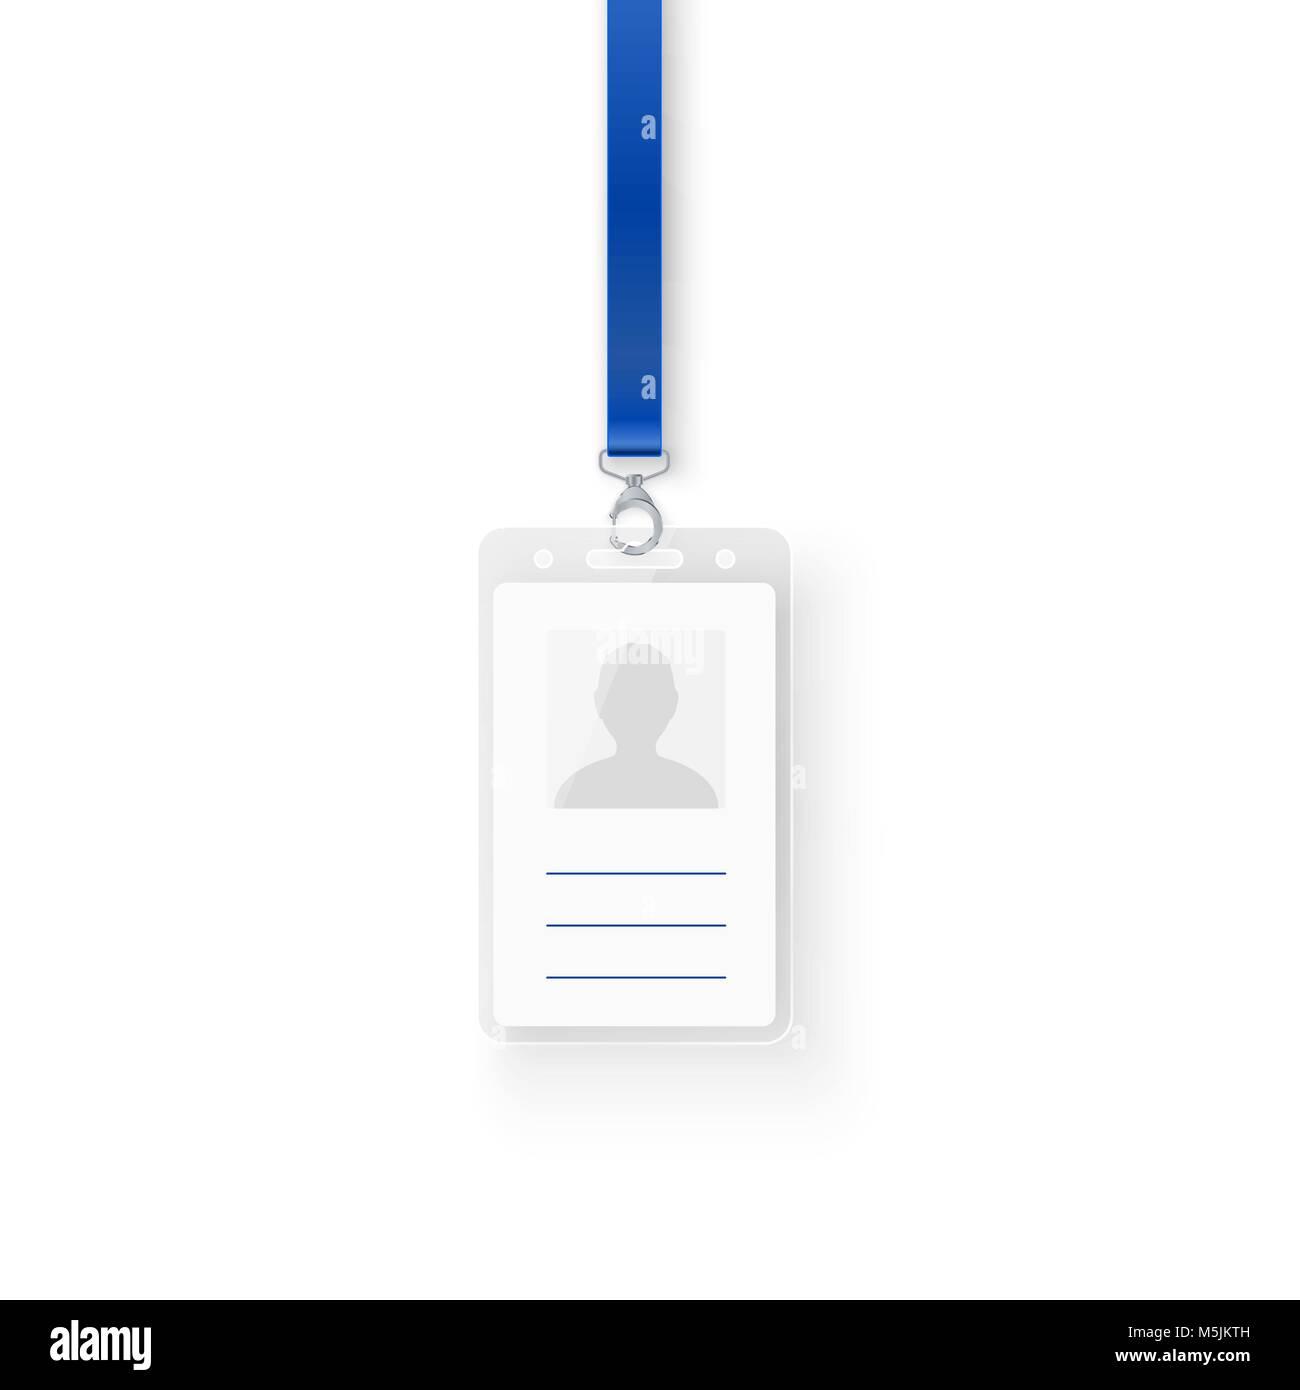 Id Badge Imágenes De Stock & Id Badge Fotos De Stock - Alamy